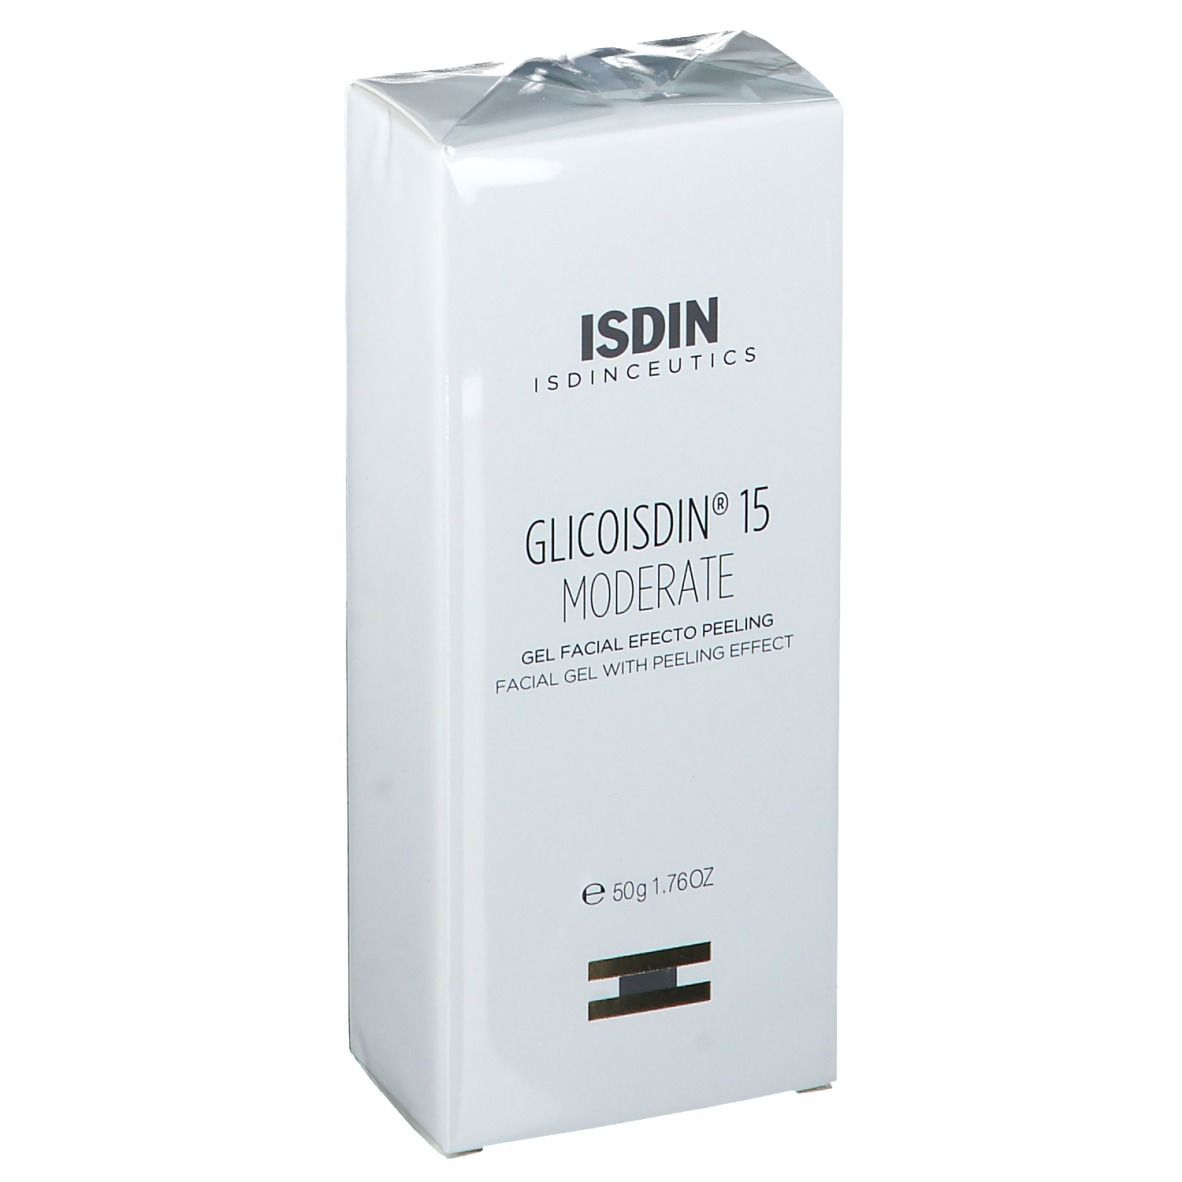 Image of ISDIN ISDINCEUTICS GLICOISDIN® 15 MODERATE